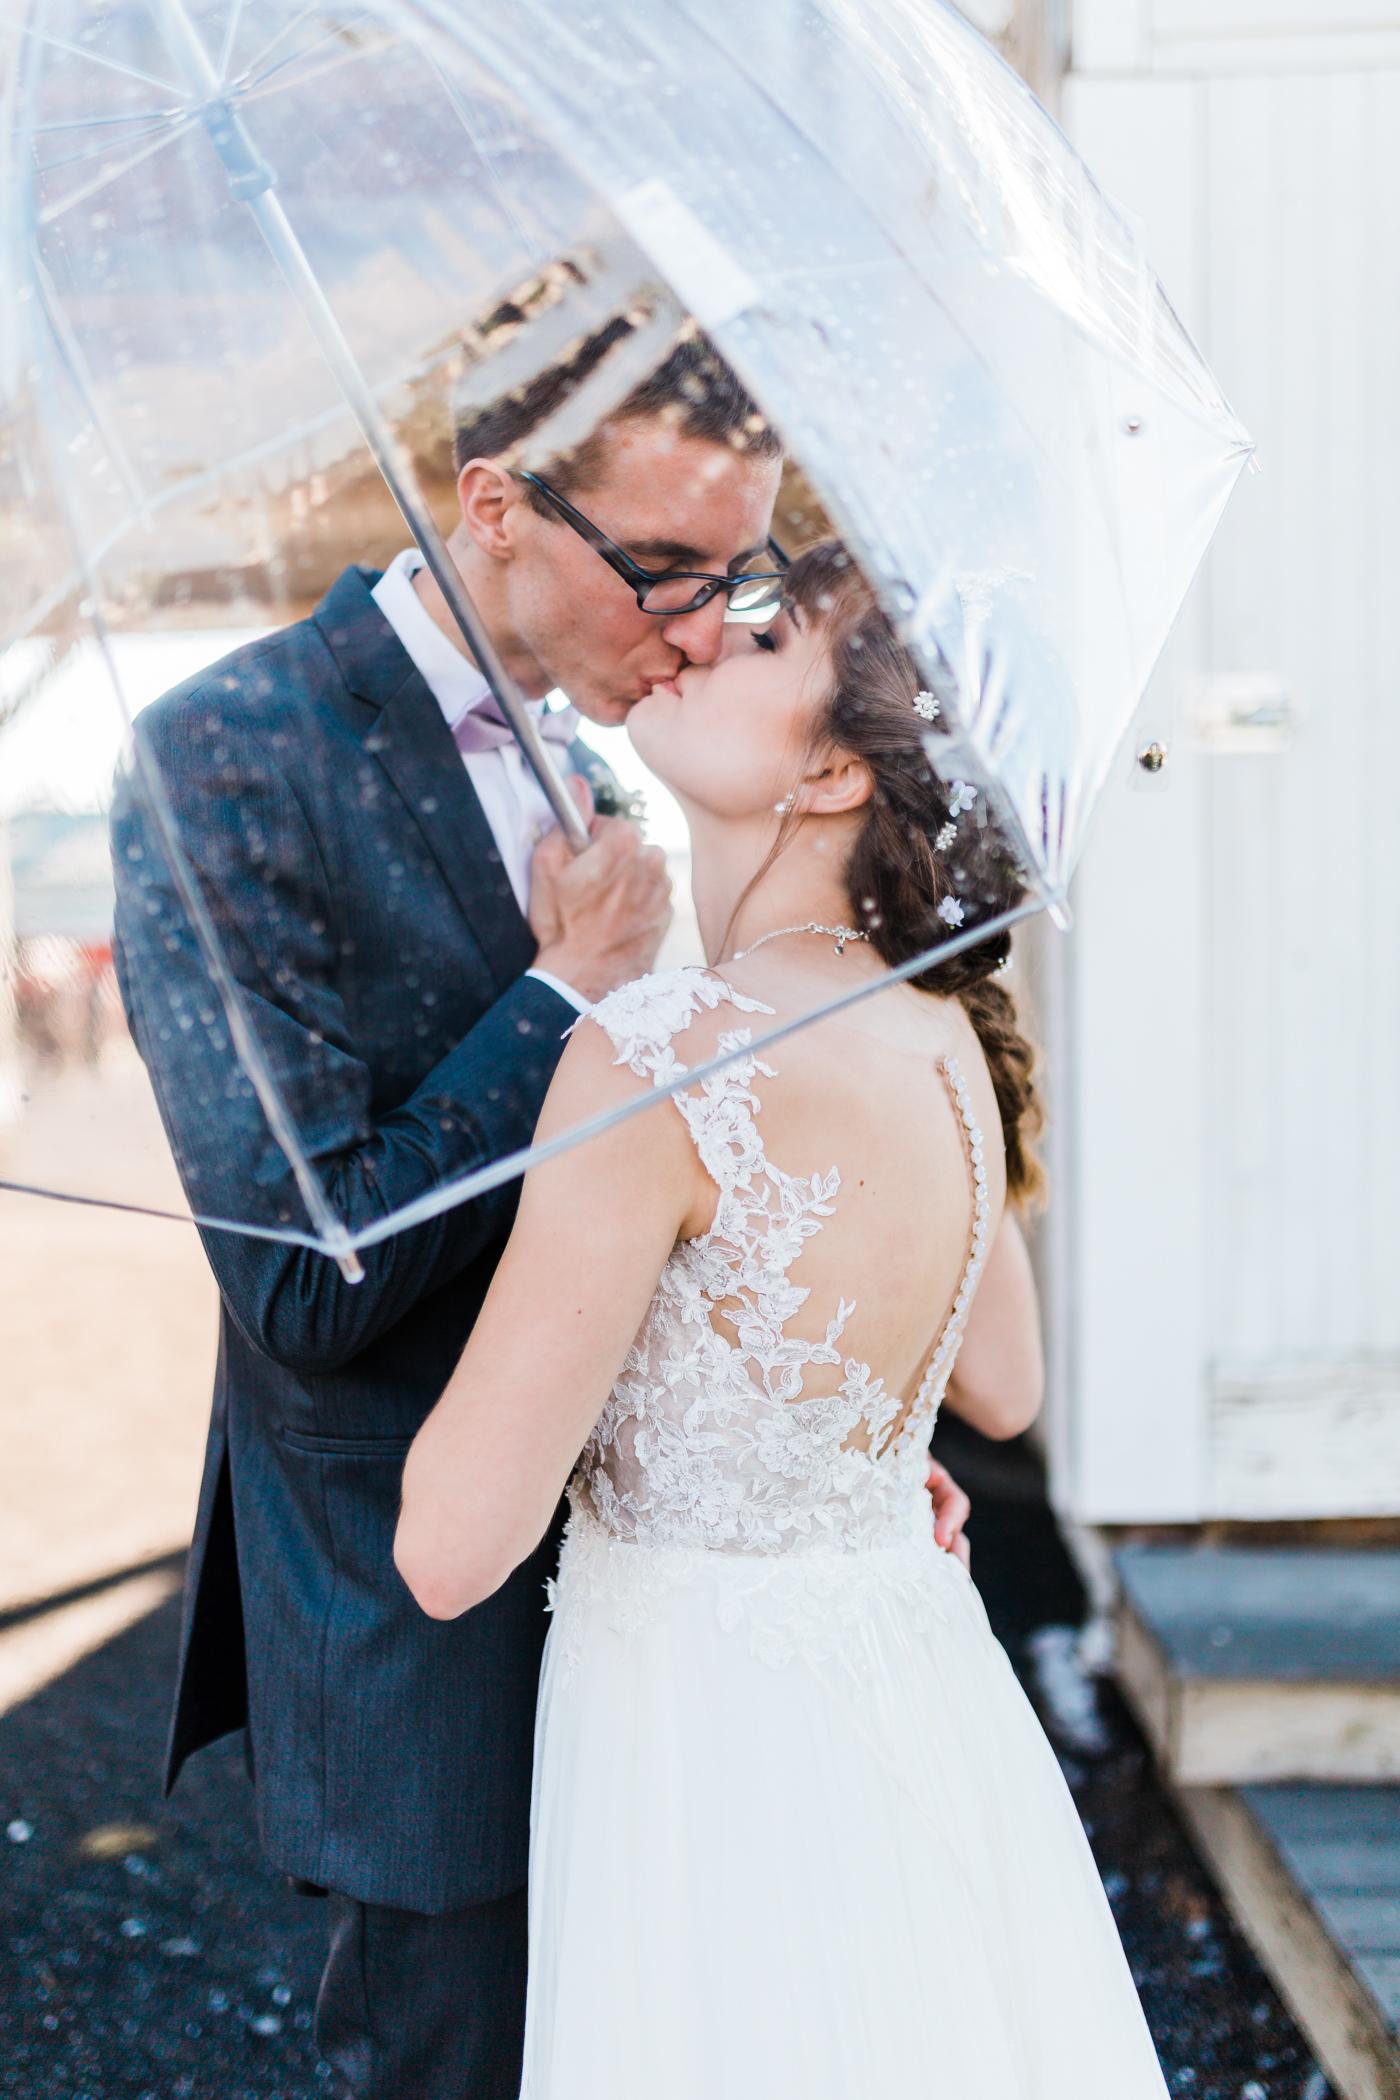 bride and groom share a romantic kiss under an umbrella - top maryland wedding photographer